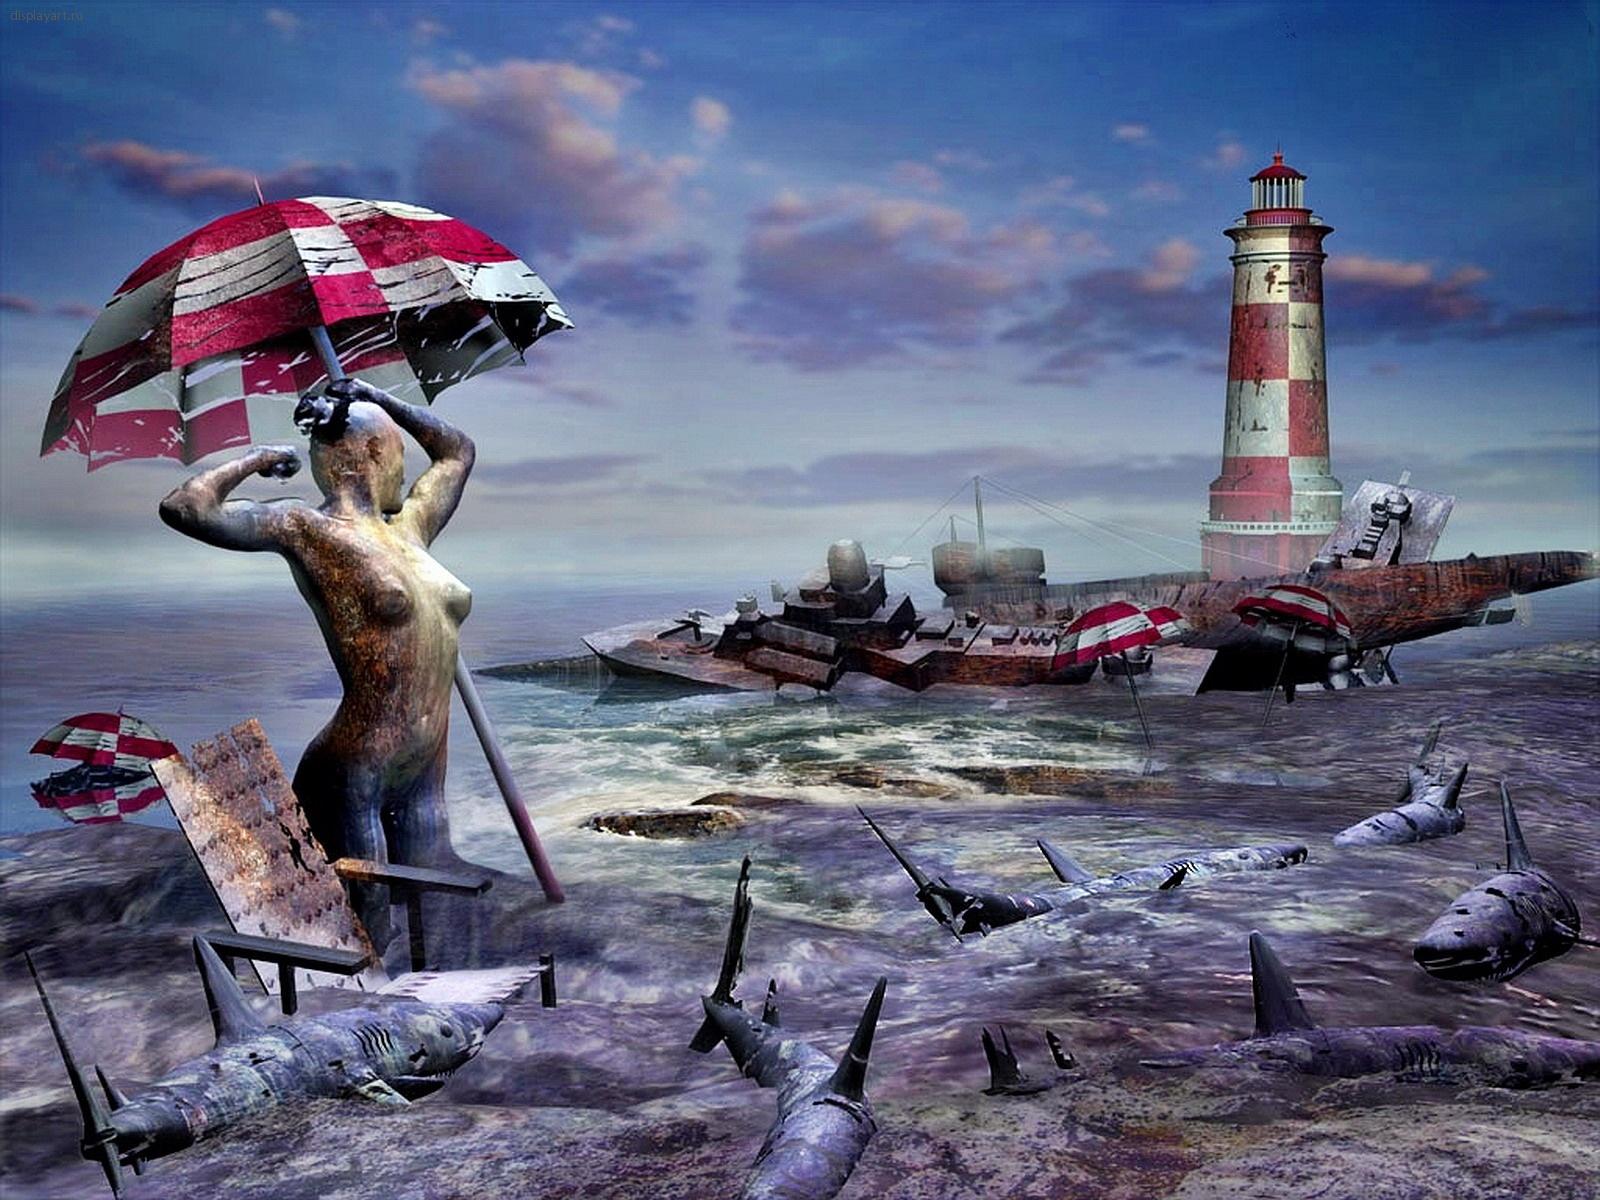 Fantasy Art Wallpapers 3D Digital Image Gallery Pictures of surrealism art